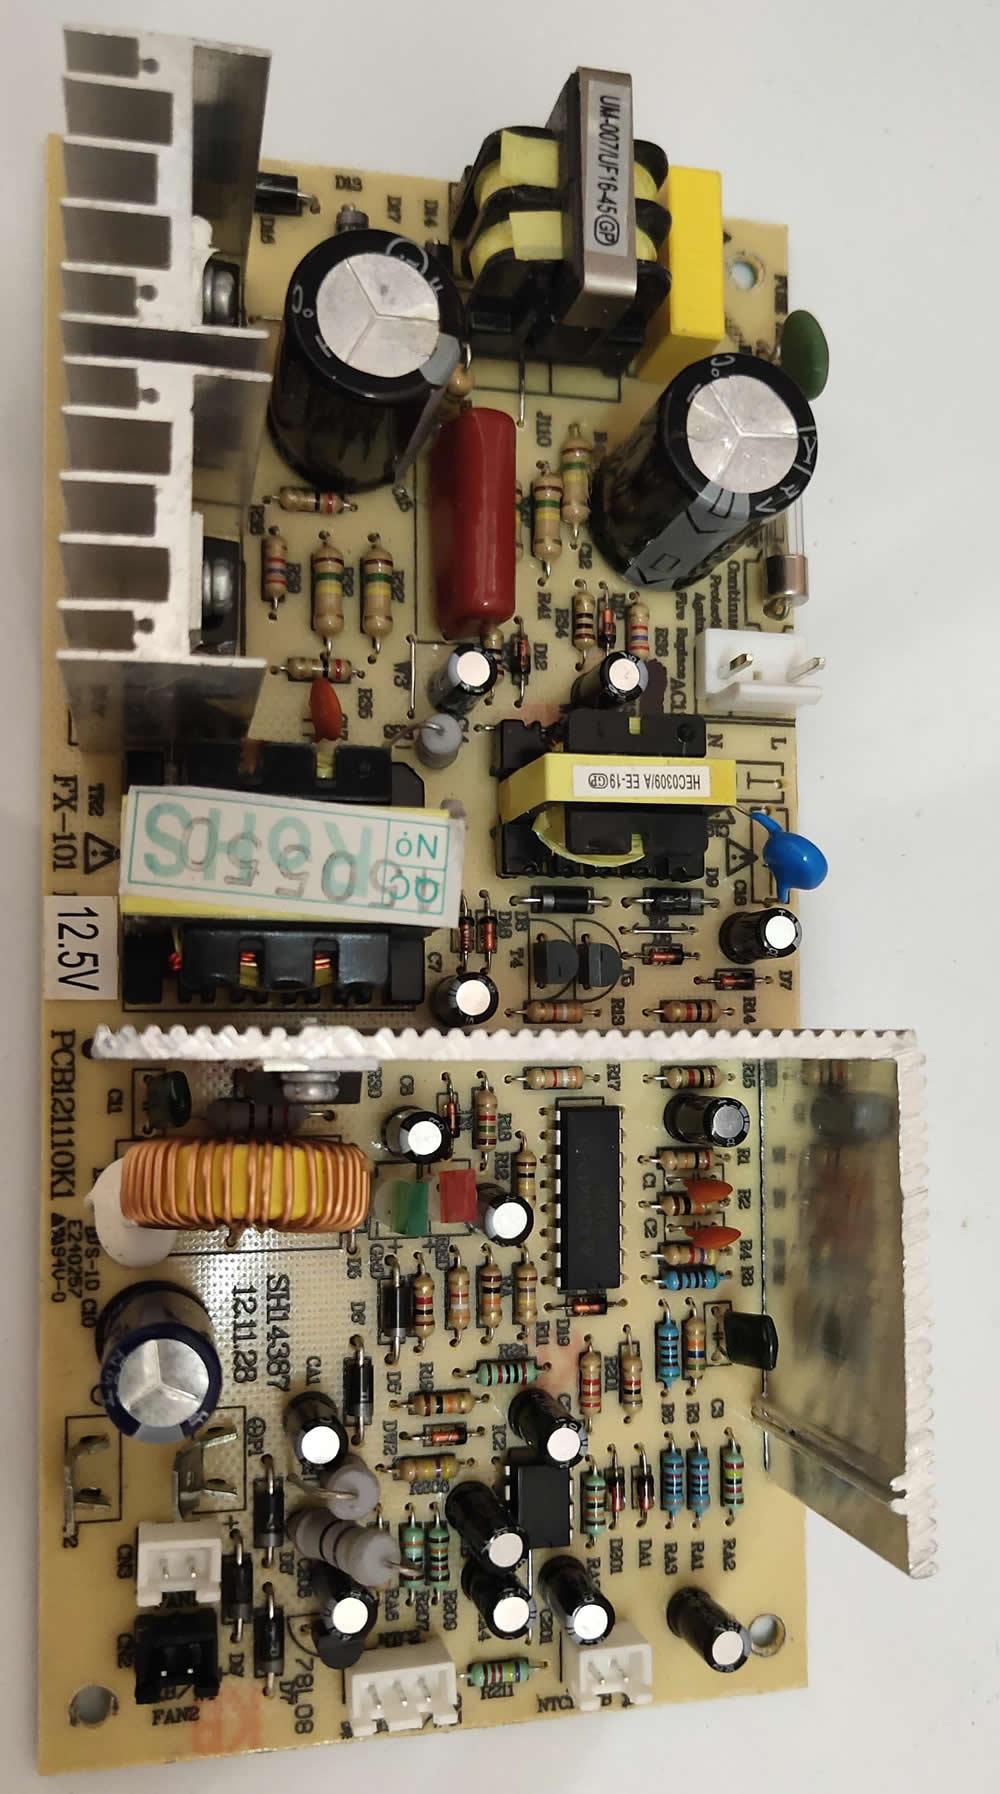 FX-101 110V 12.5V 10.5V Wine cooler refrigerator freezer accessories power control board